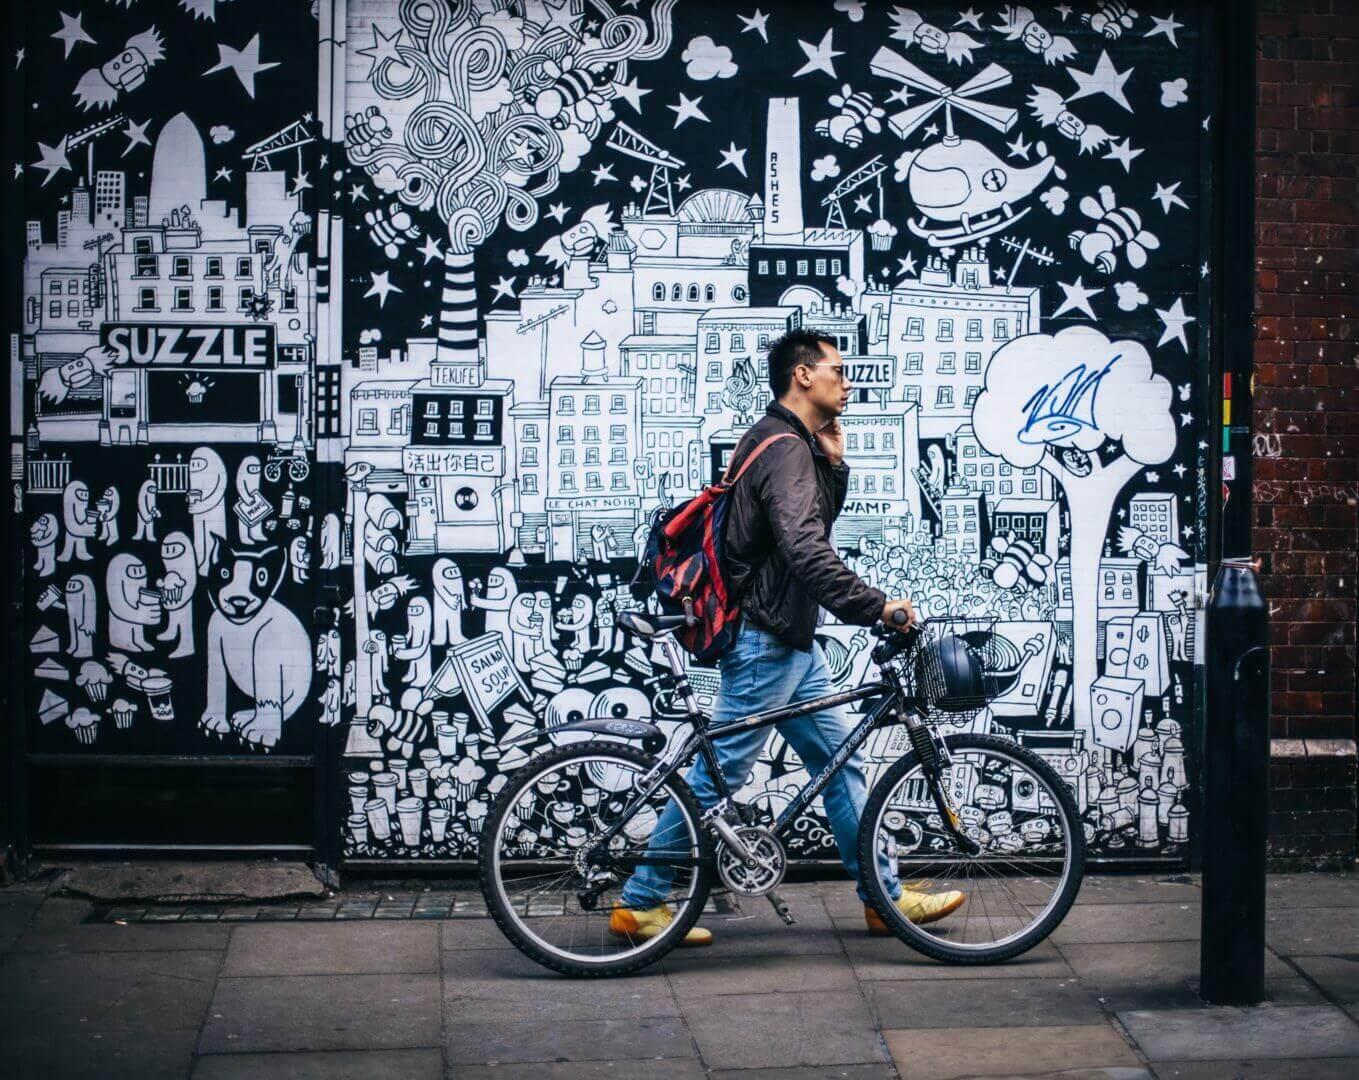 mostre-2018-street-art-Pequod